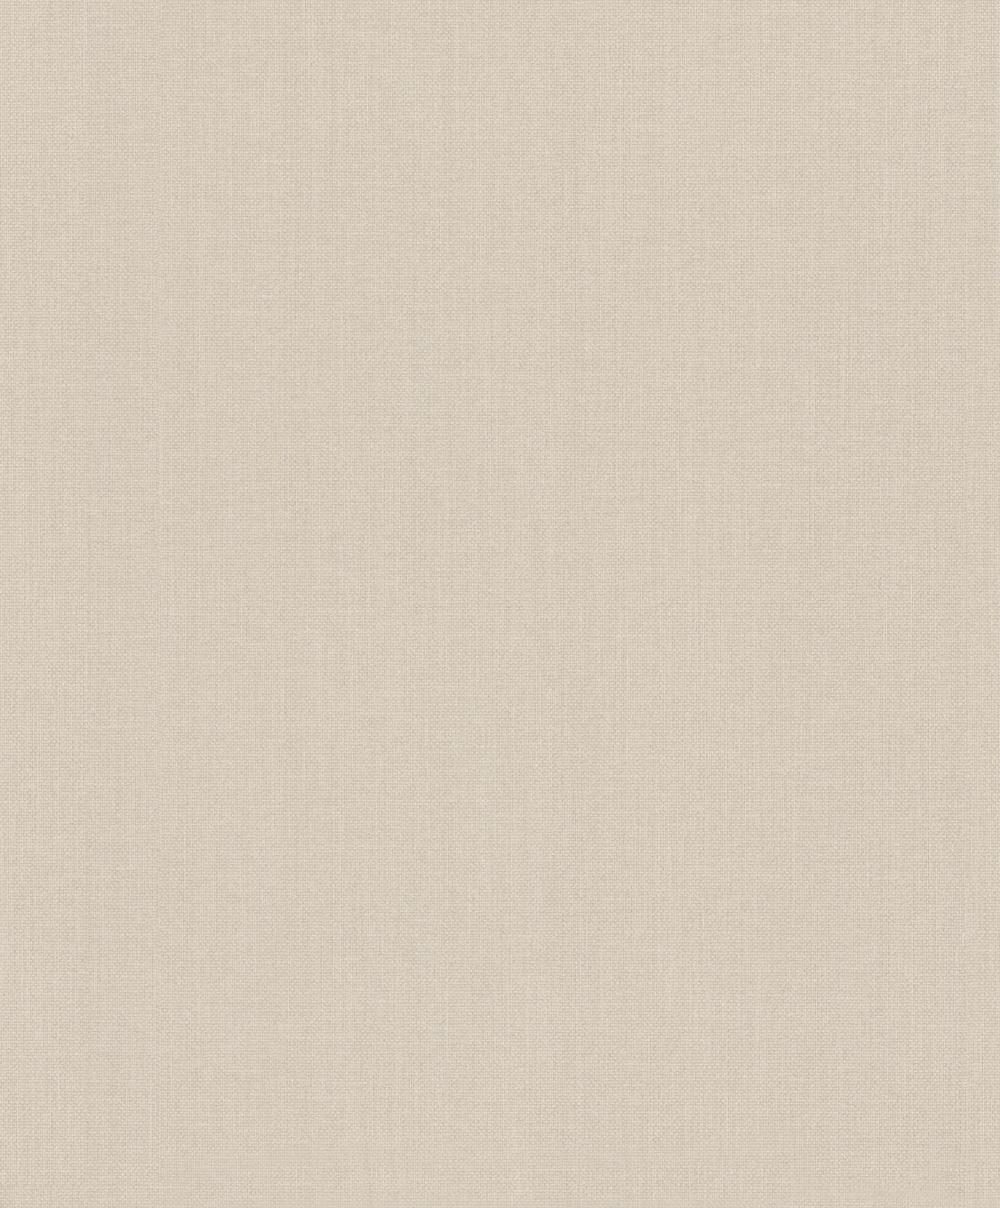 Textil tapete struktur design cremegrau rasch textil 079318 for Tapeten struktur design